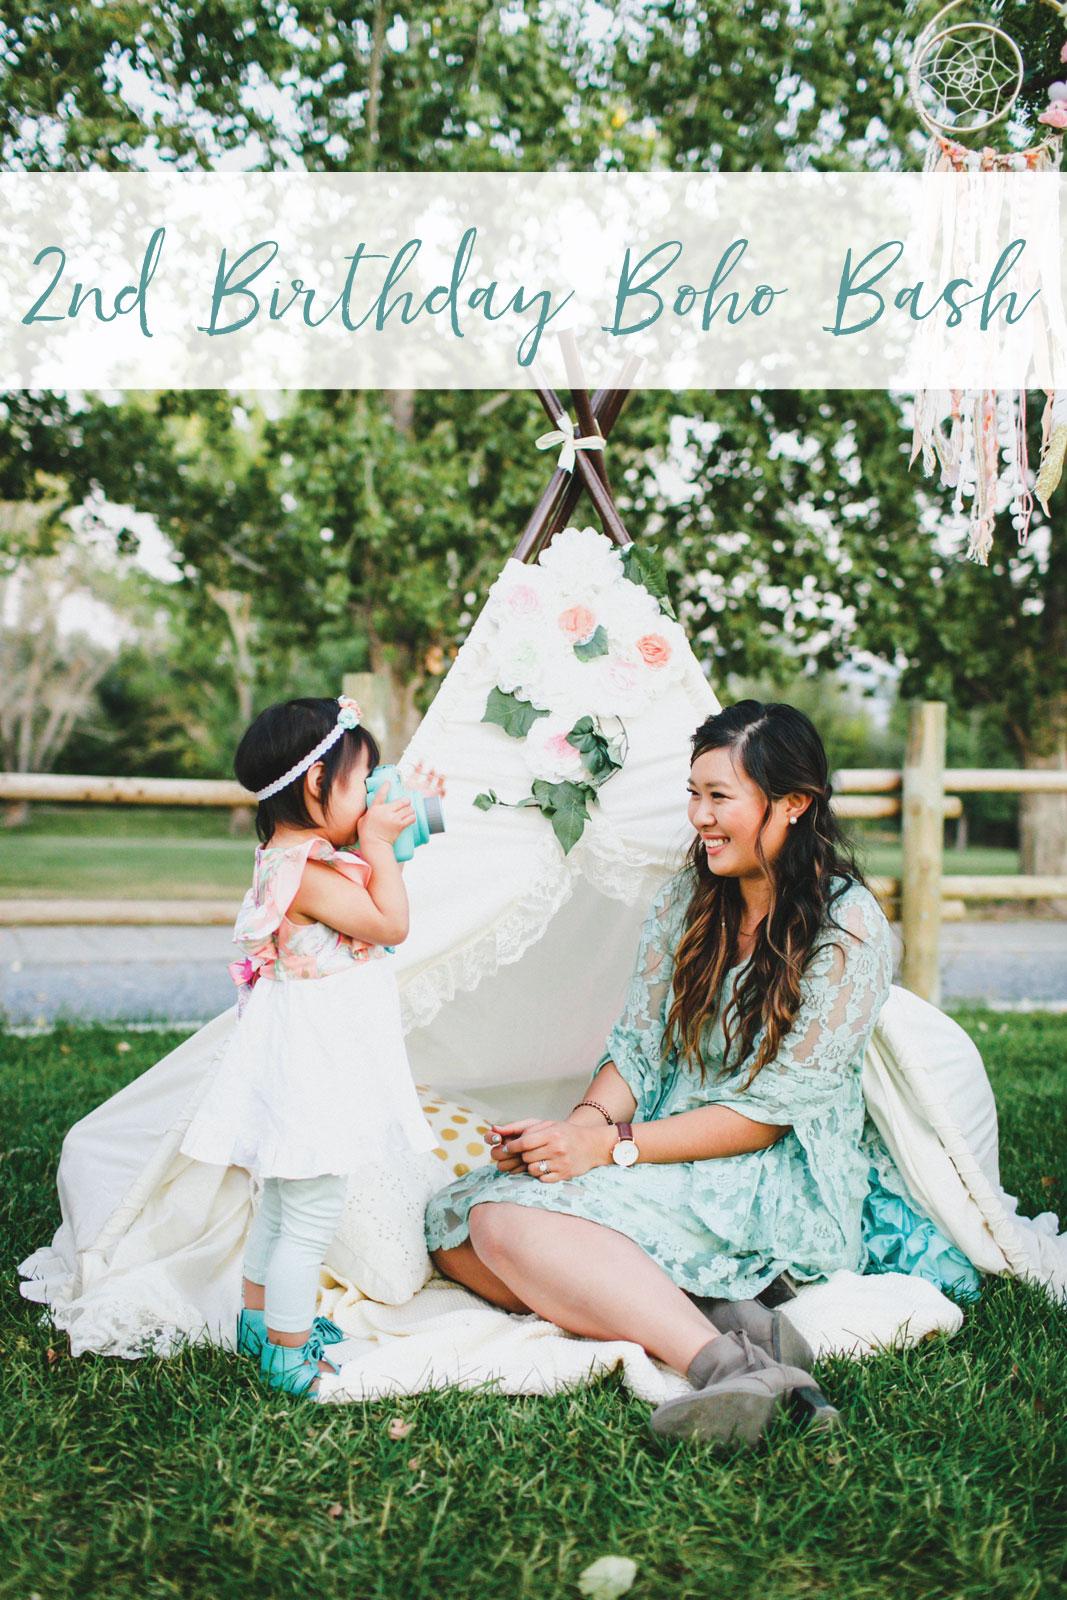 2nd Birthday Boho Party - Bohemian Birthday Party